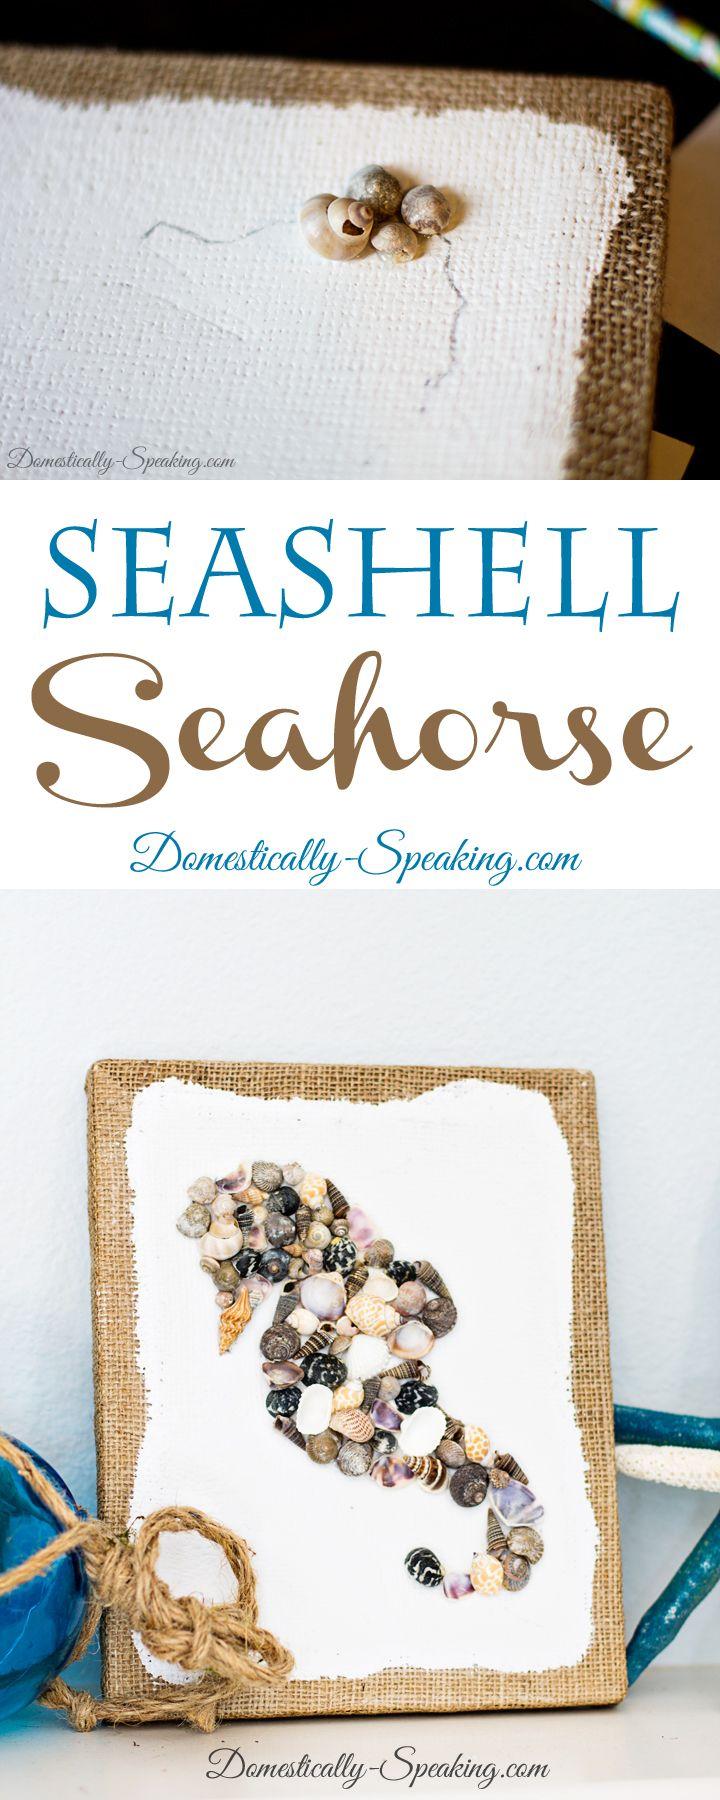 Beach crafts DIY Seashell Seahorse Craft